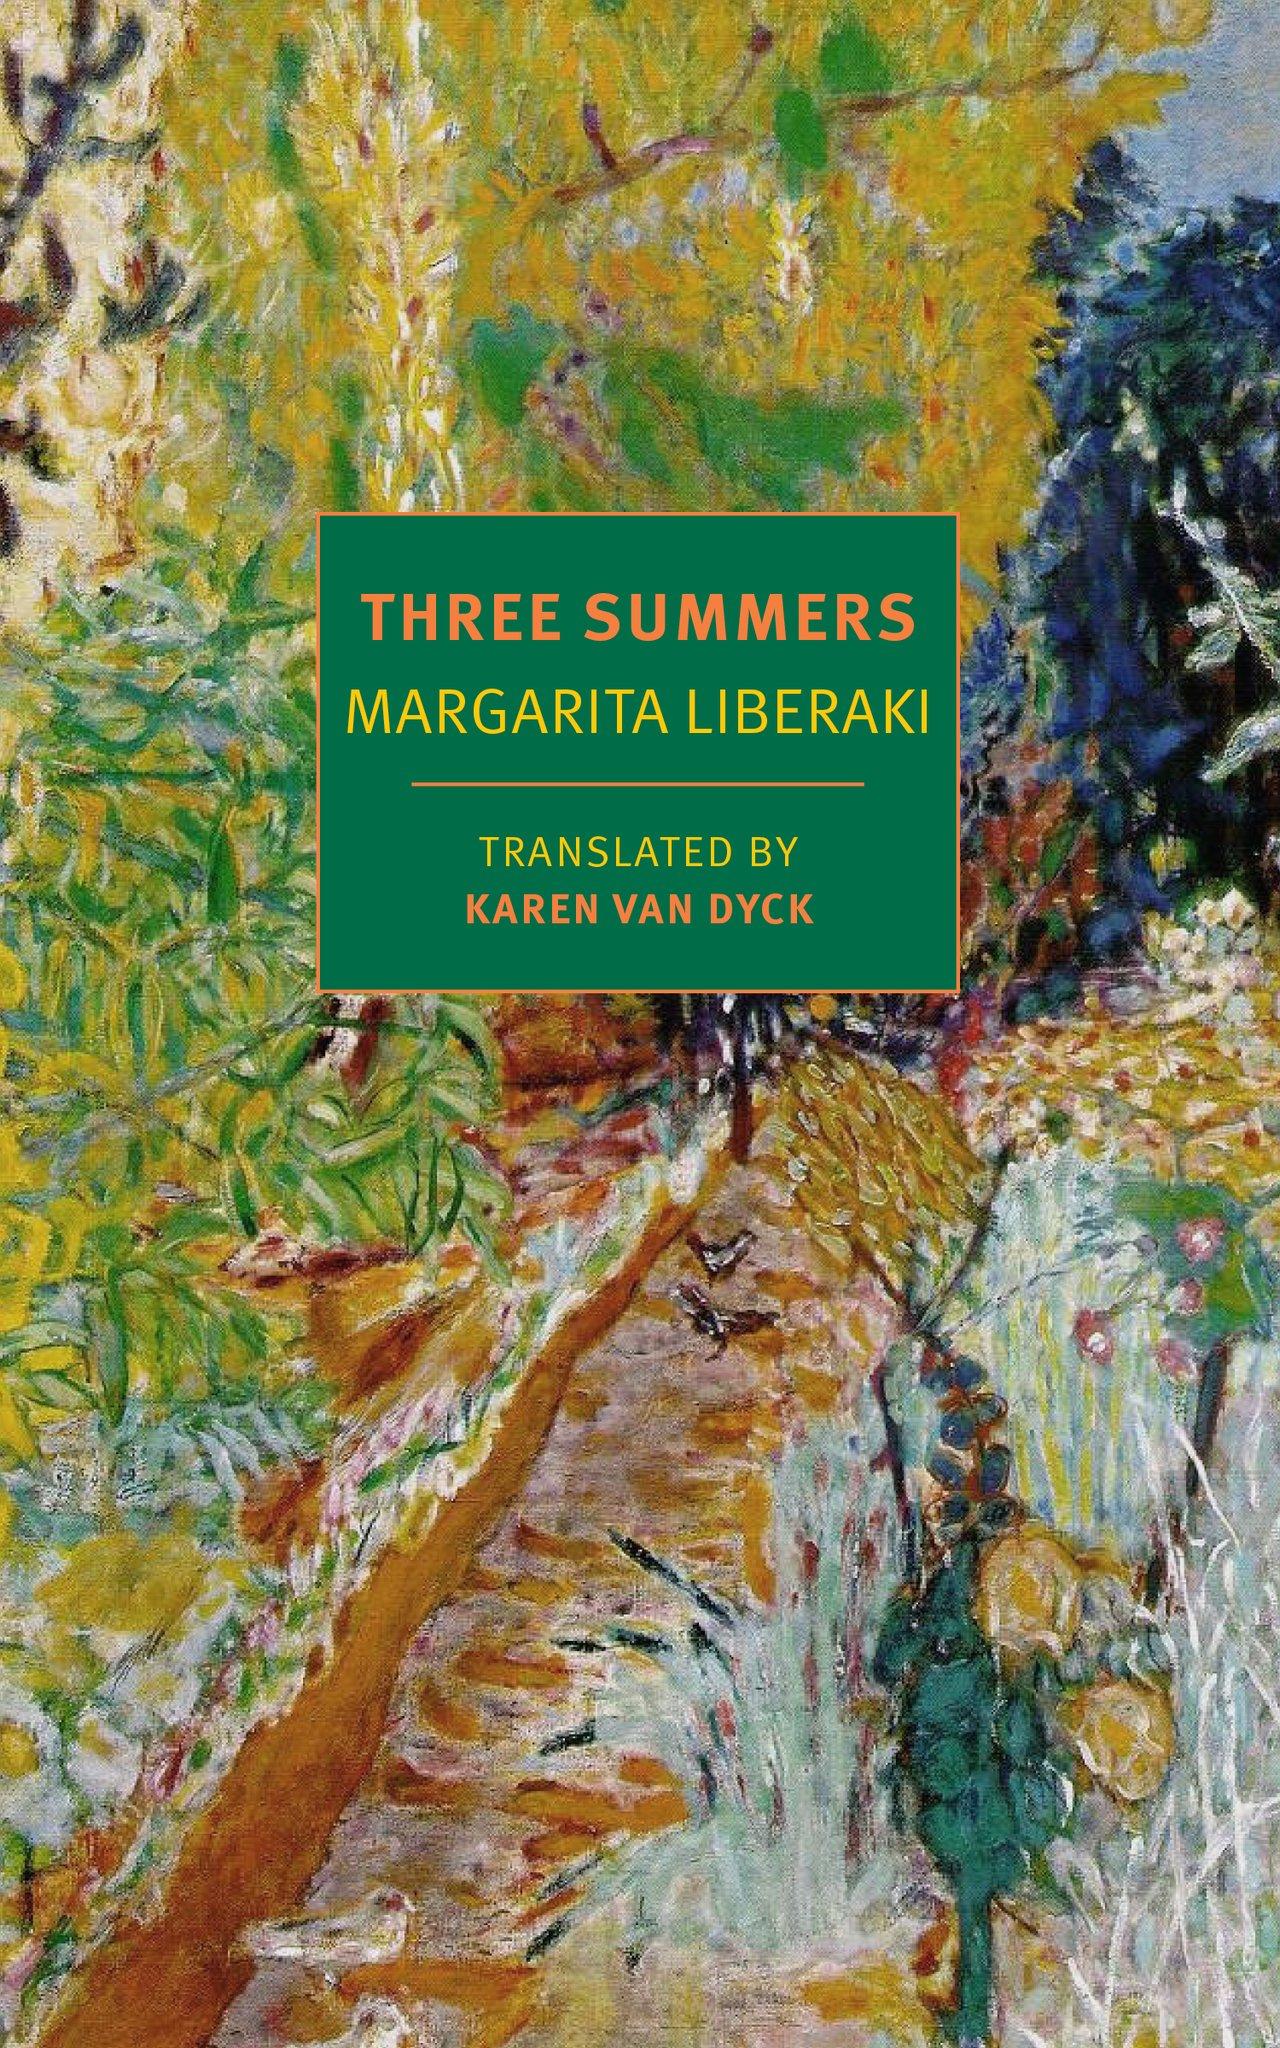 Three Summers, a novel by Margarita Liberaki